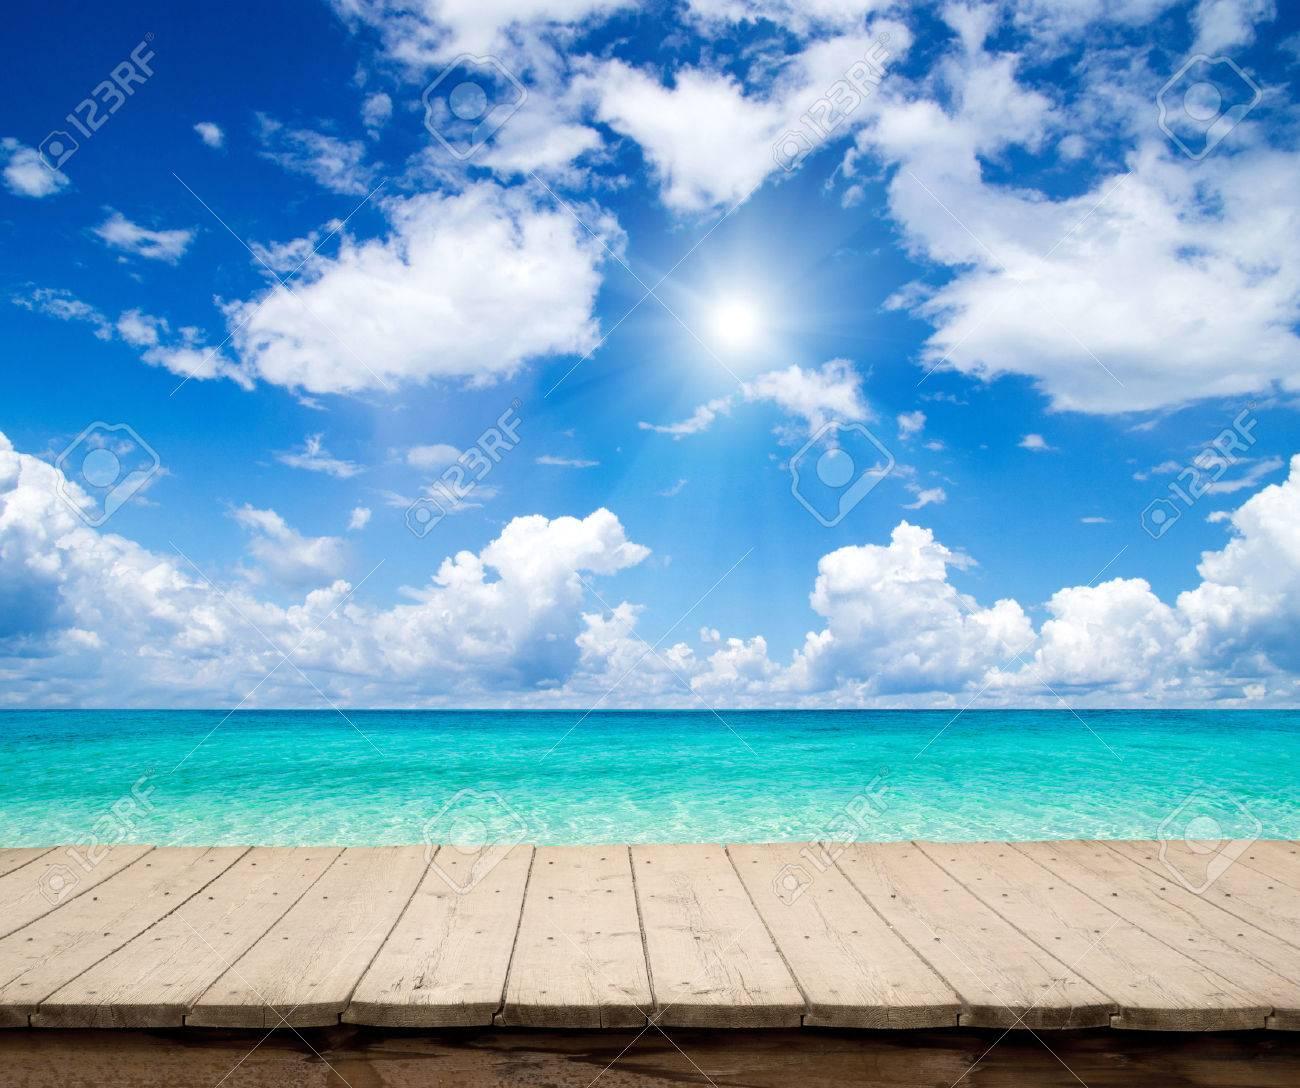 beautiful beach and tropical sea - 40695487